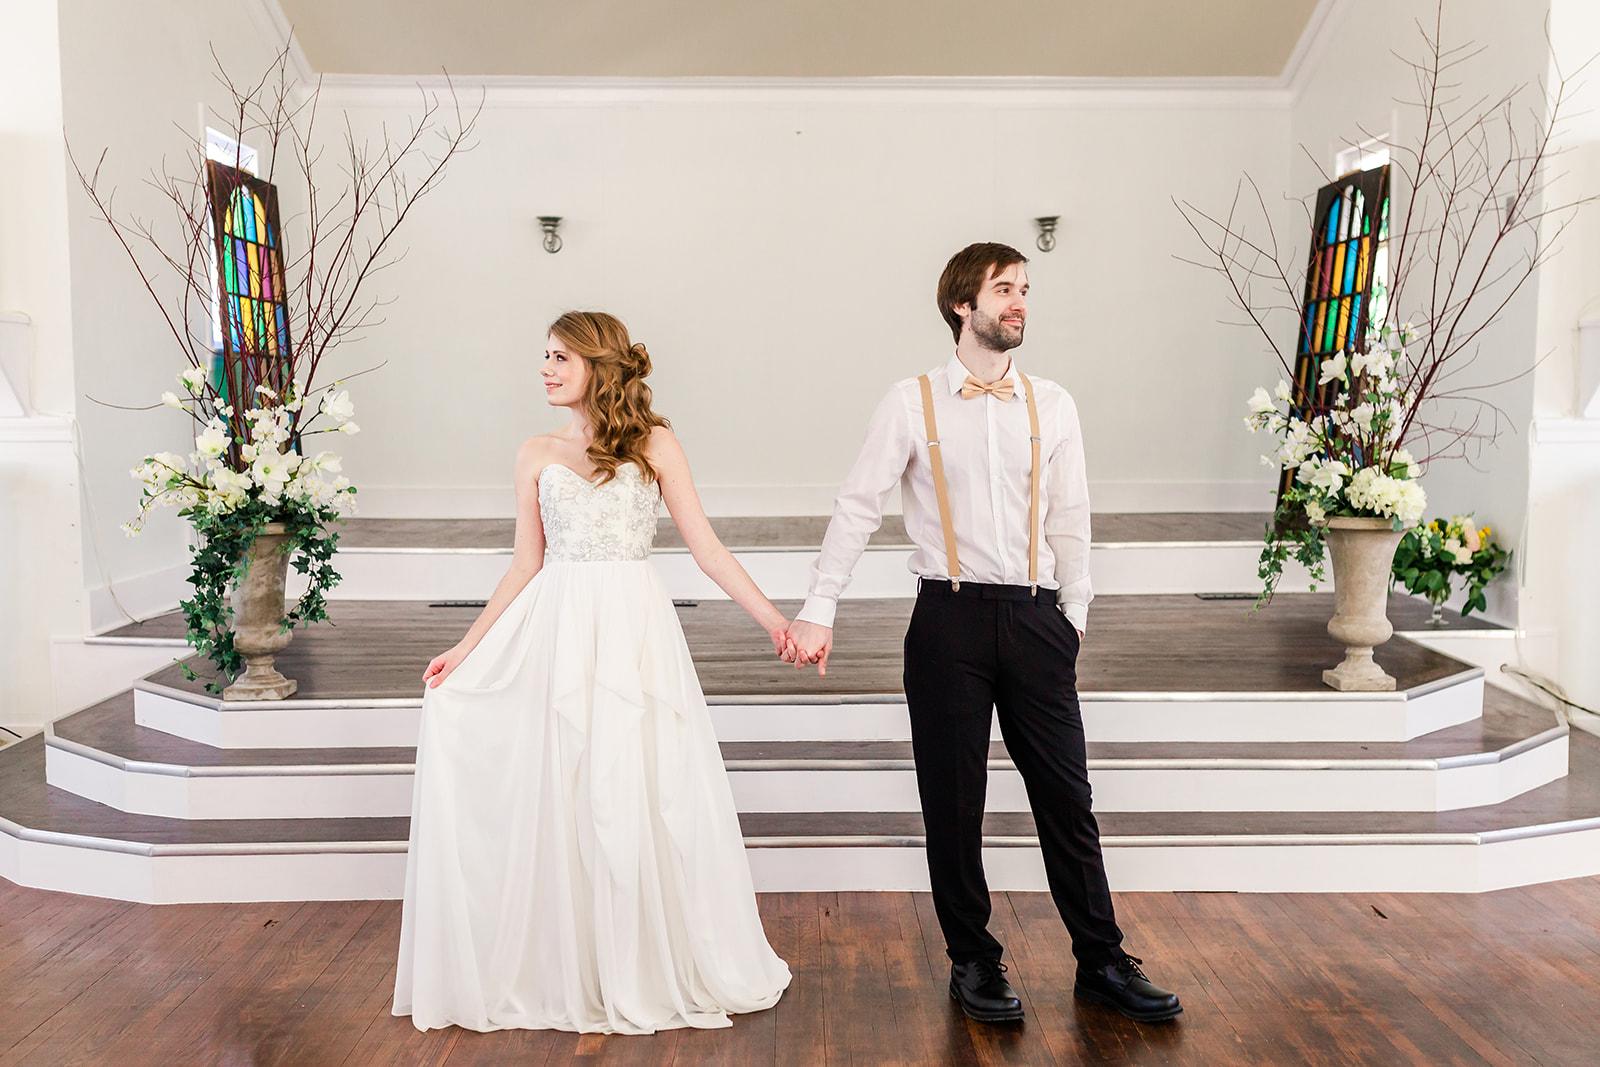 Picture By:  Megan Hoeft  Dress:  Ivory Loft Bridal  Florals:  Milkweed Flora